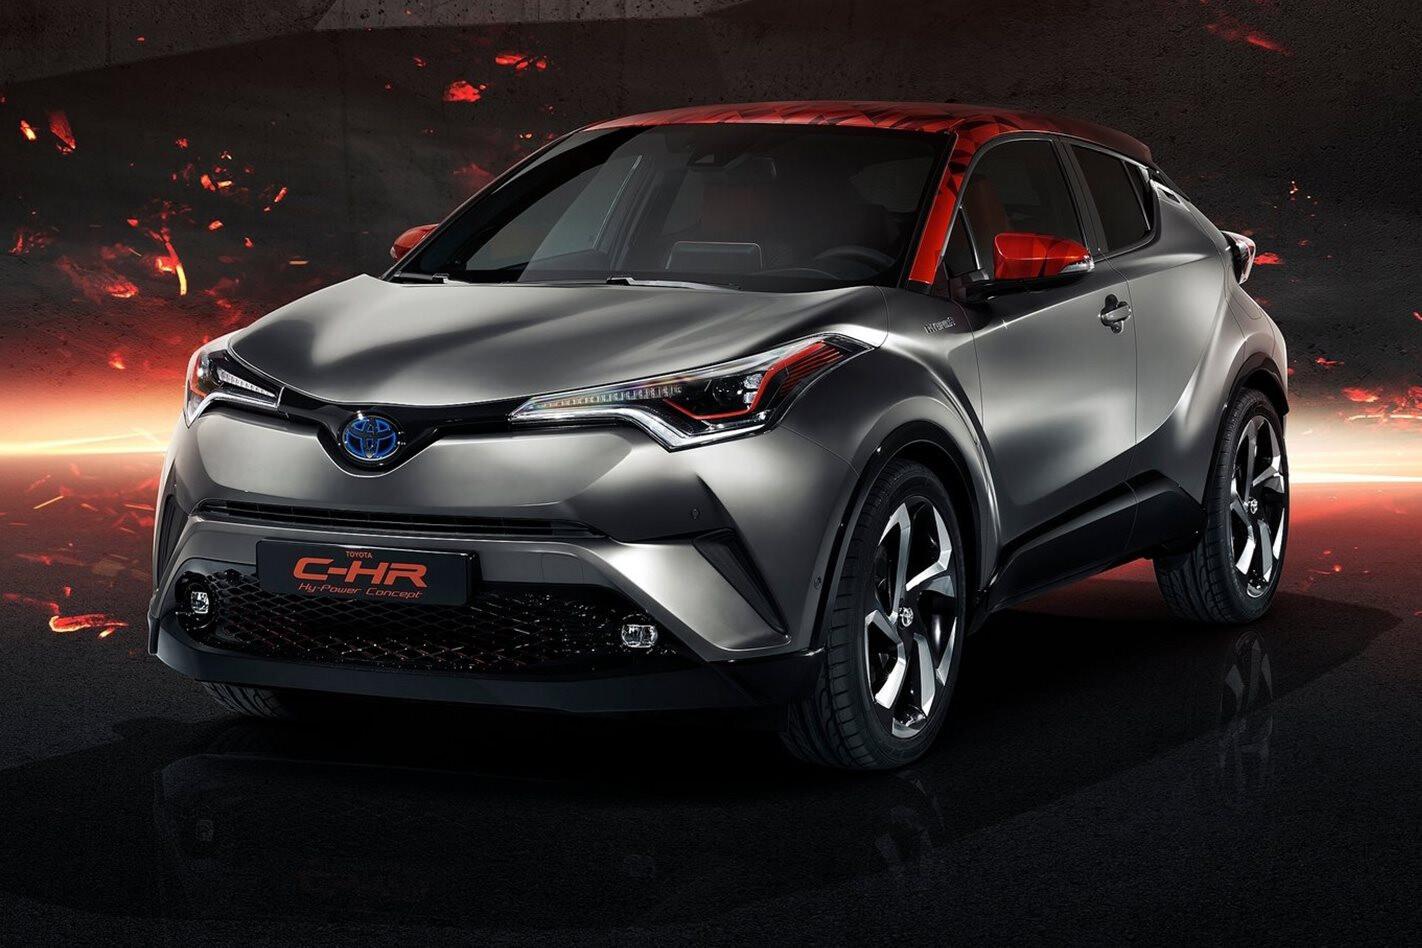 Toyota C-HR Hy-Power Concept previews future performance hybrids